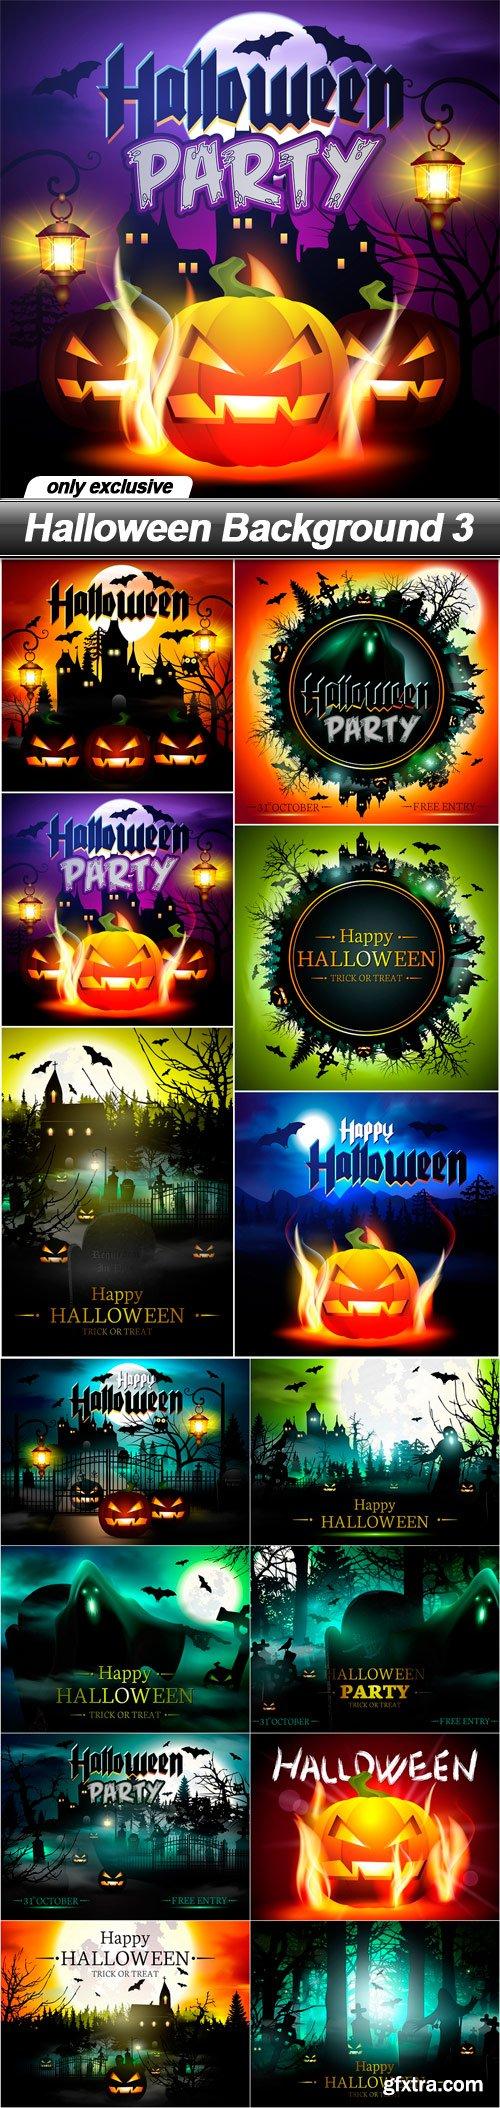 Halloween Background 3 - 14 EPS